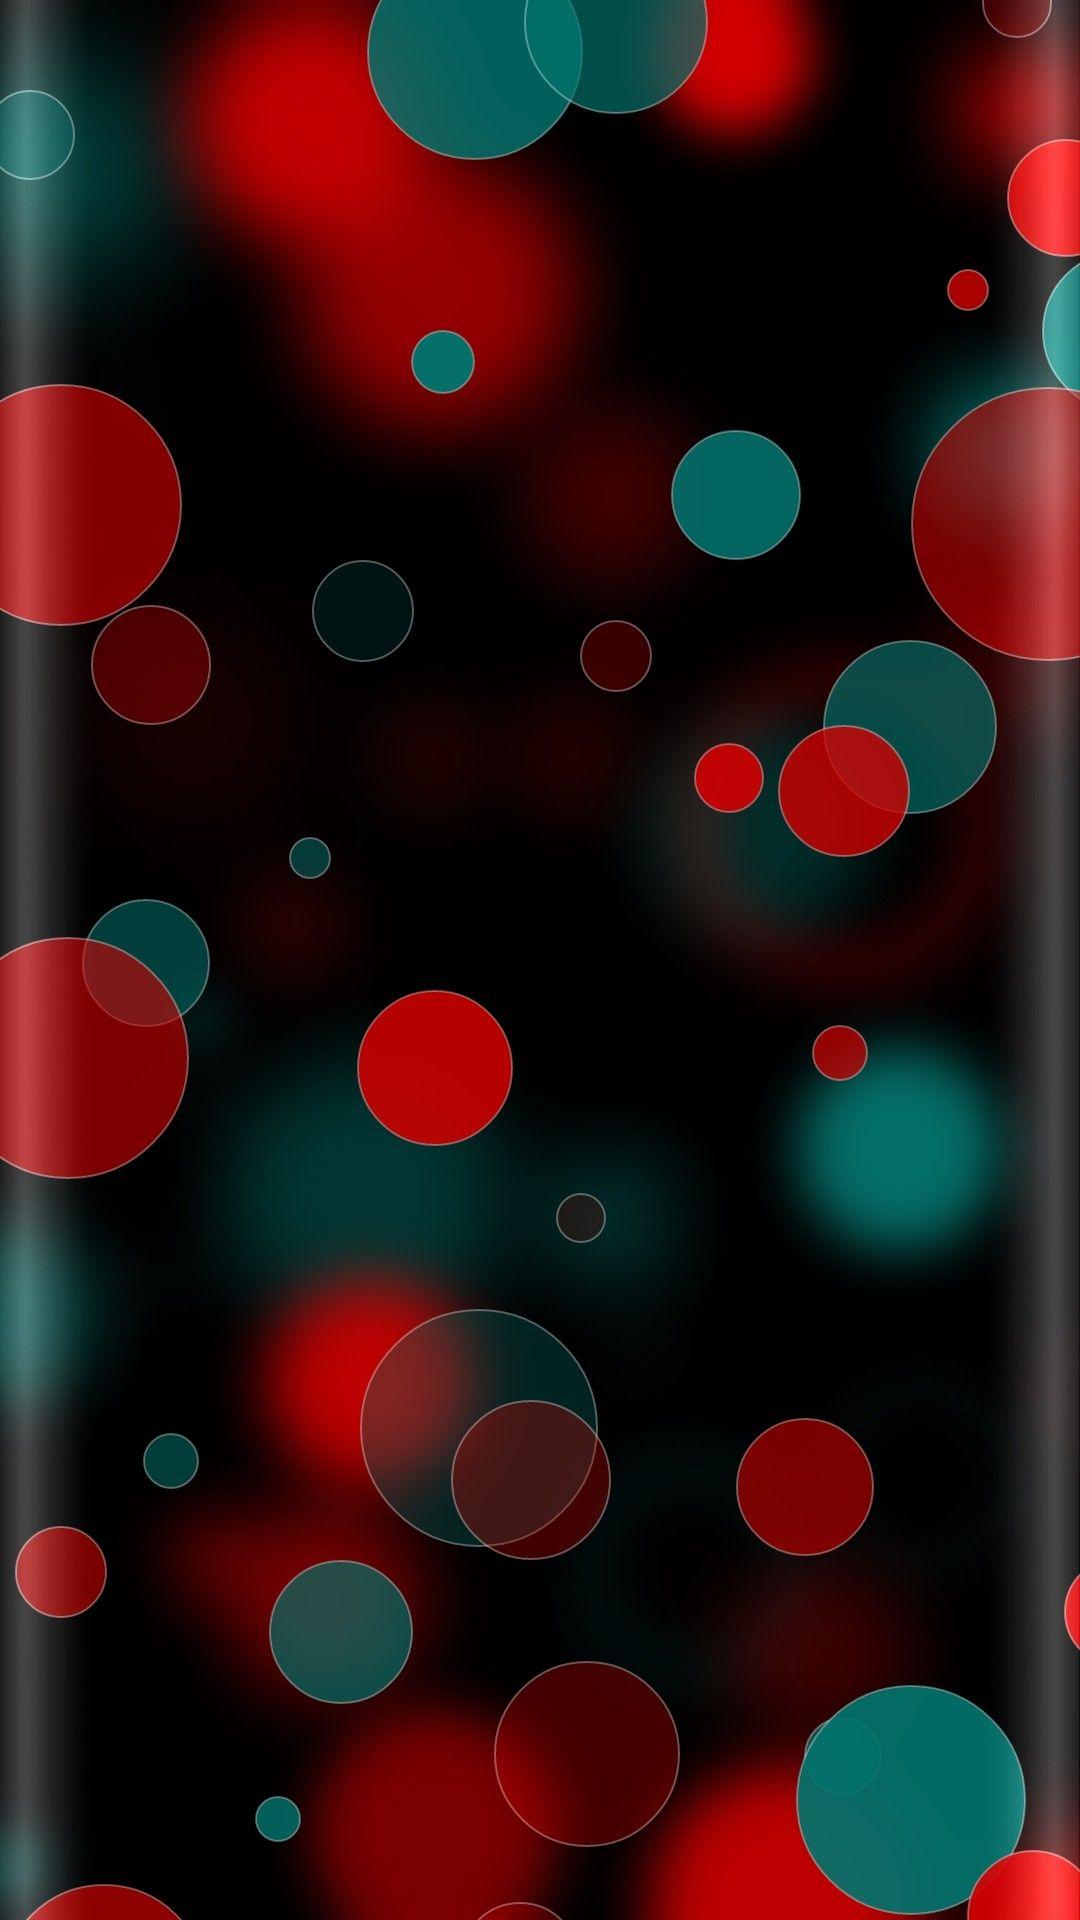 Unduh 3000+ Wallpaper 3d Vivo HD Terbaru